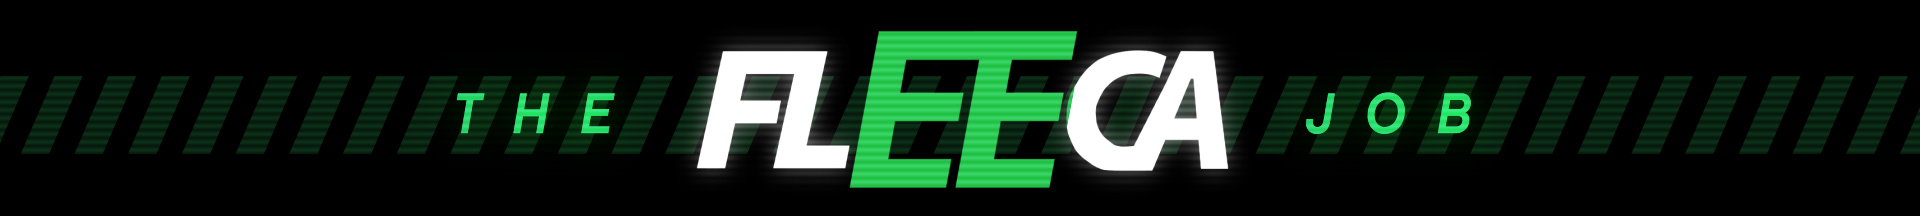 Braquage Doublé 01 - Fleeca GTA Online